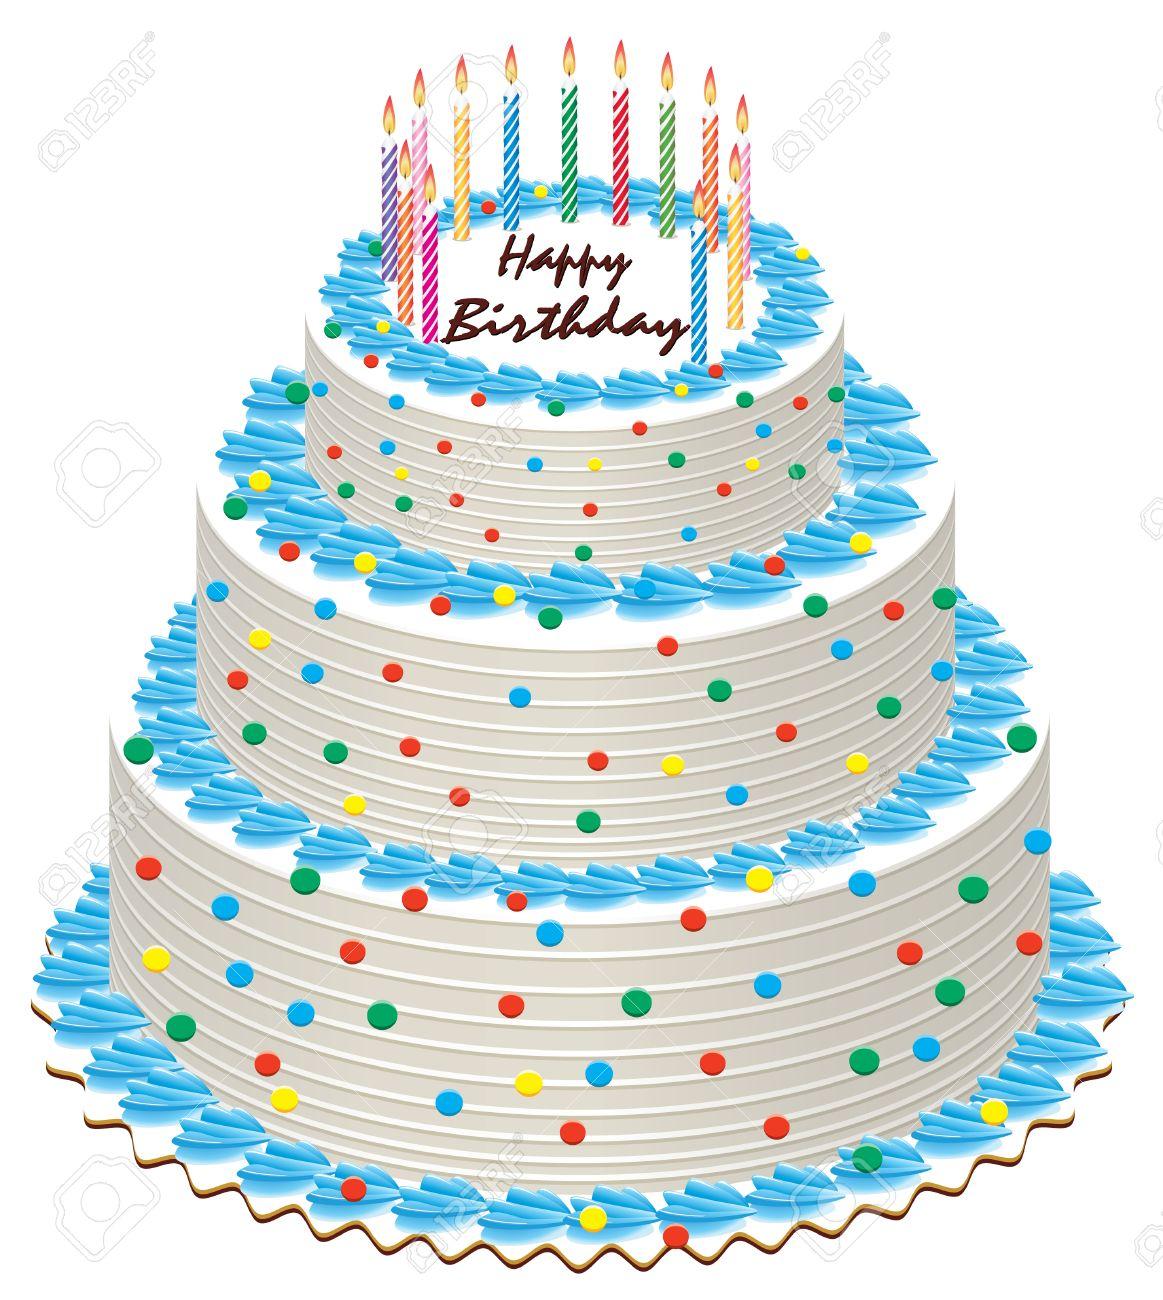 Big Illustration Of Birthday Cake With Burning Candles Royalty